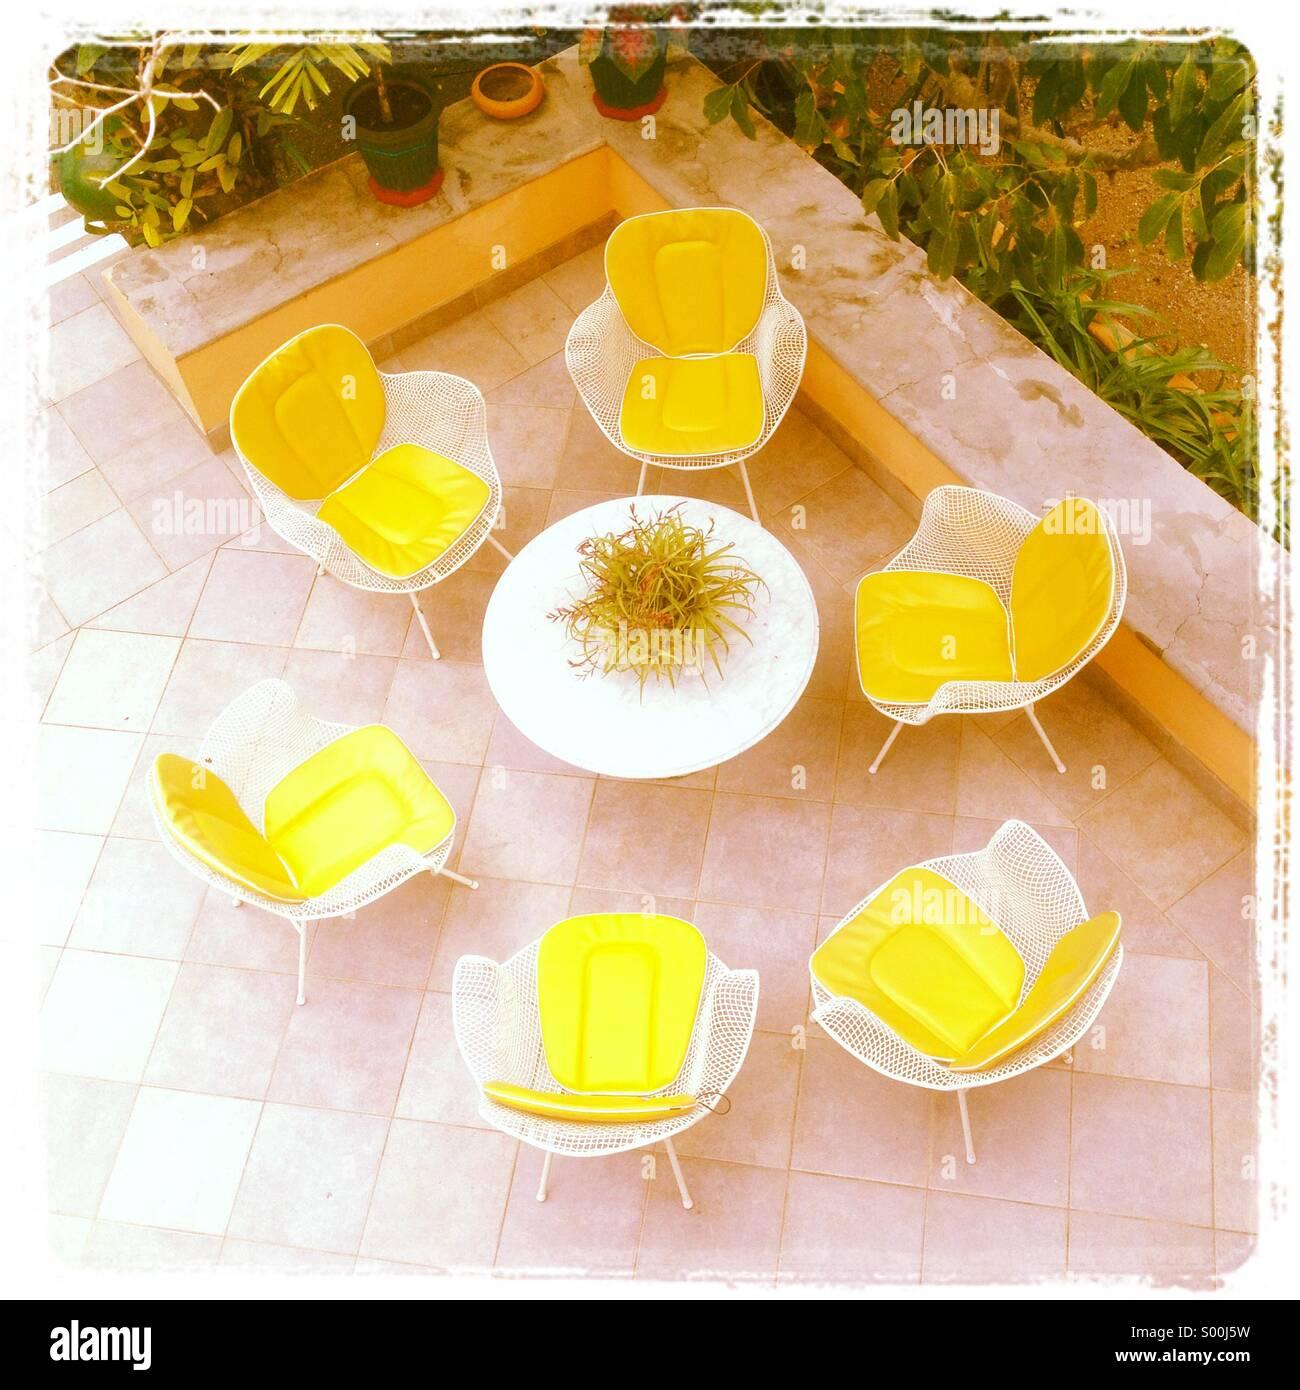 Yellow circle - Stock Image